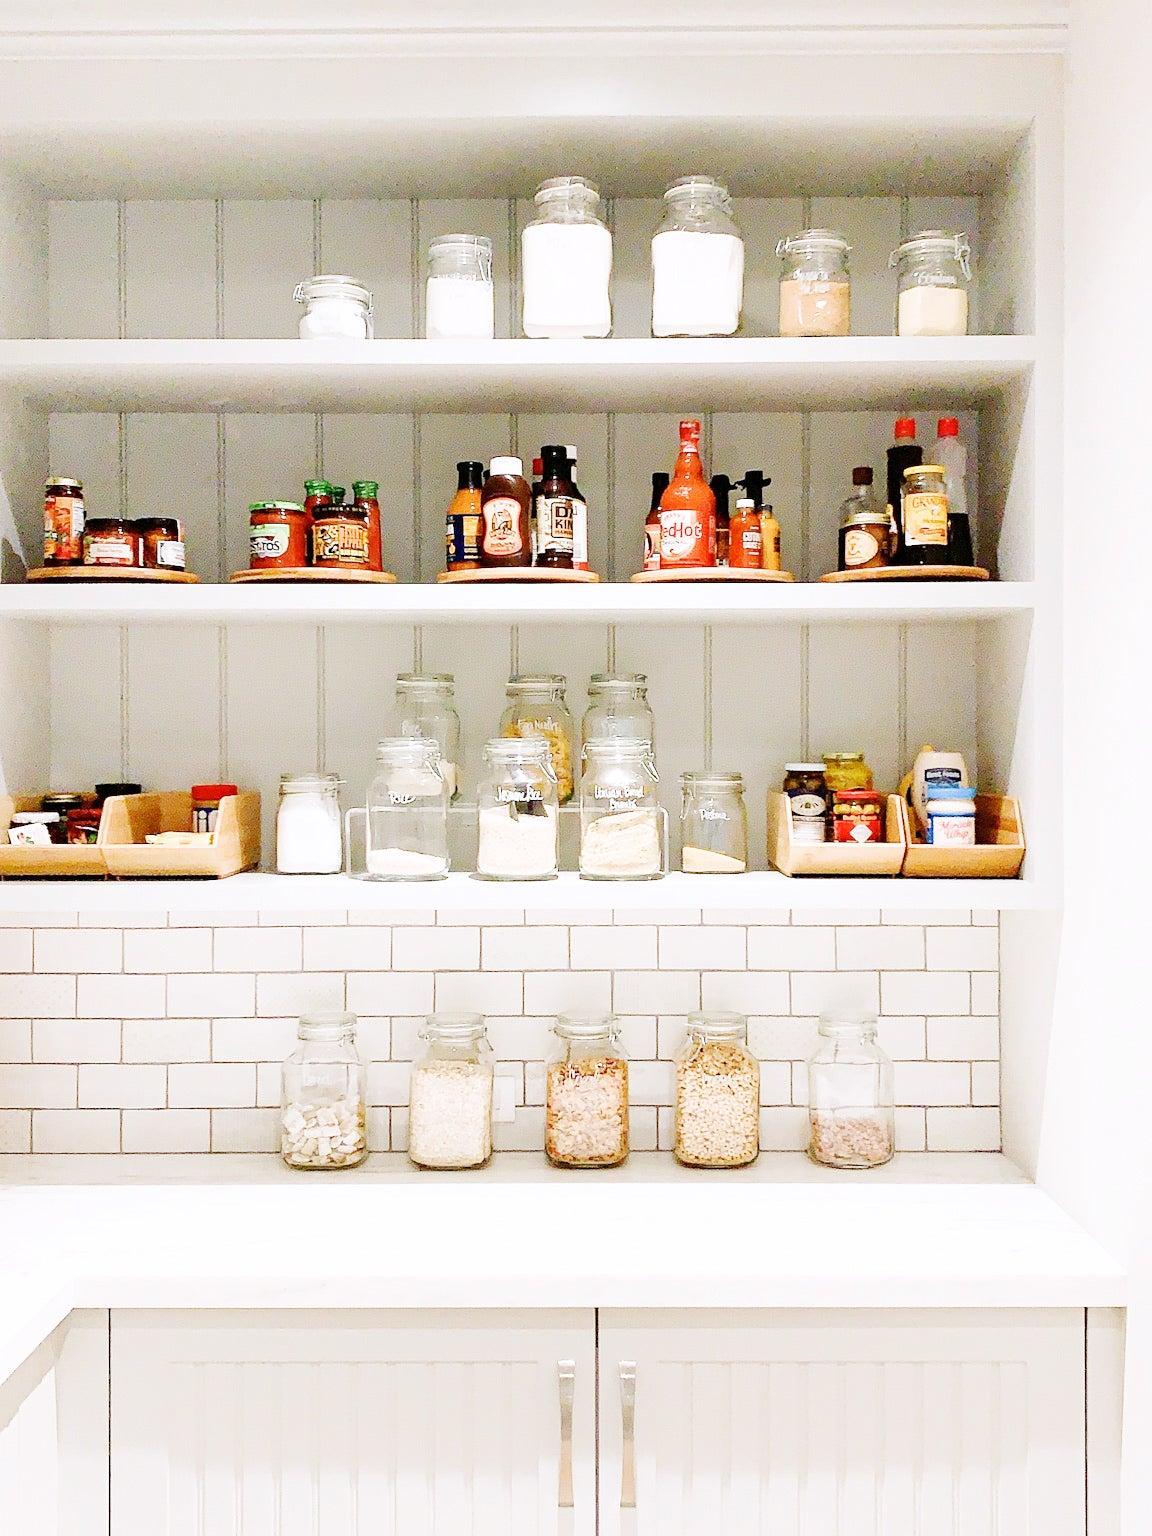 00-FEATURE-kitchen-organizing-hacks-domino